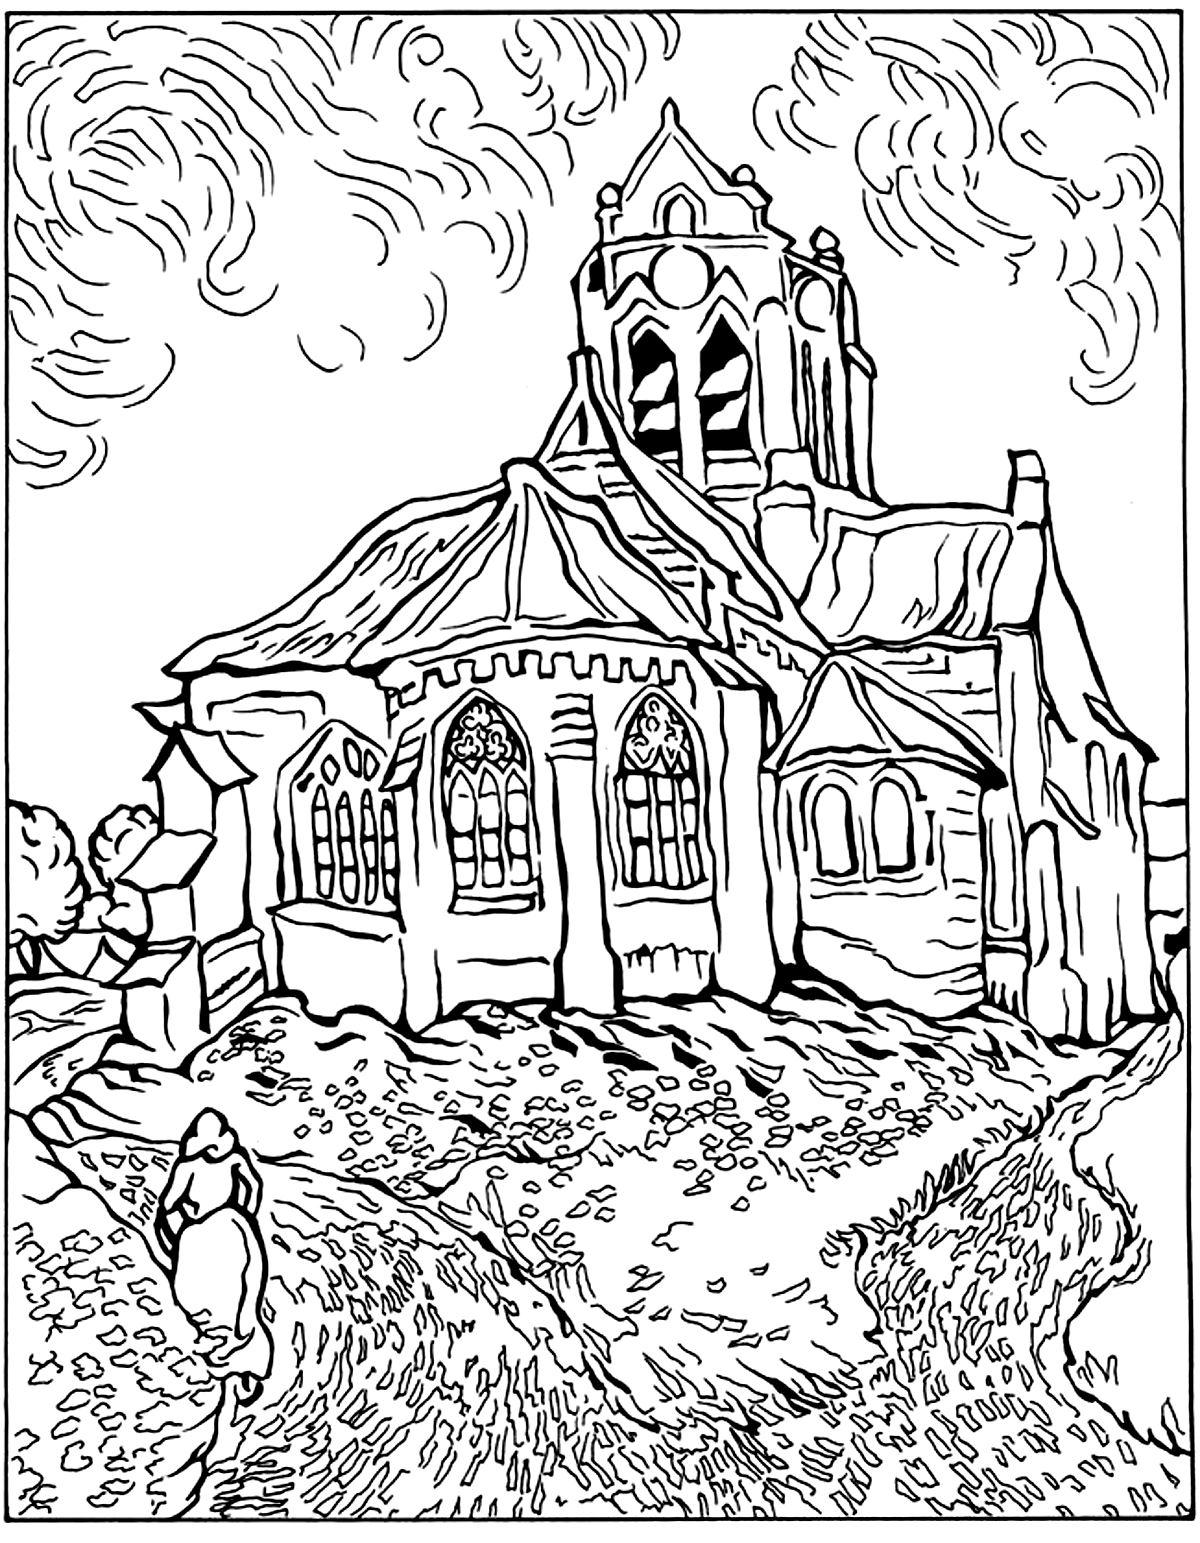 Volwassen Kleurplaten En Mandalas Van Gogh Auvers Church Masterpieces Adult Coloring Pages